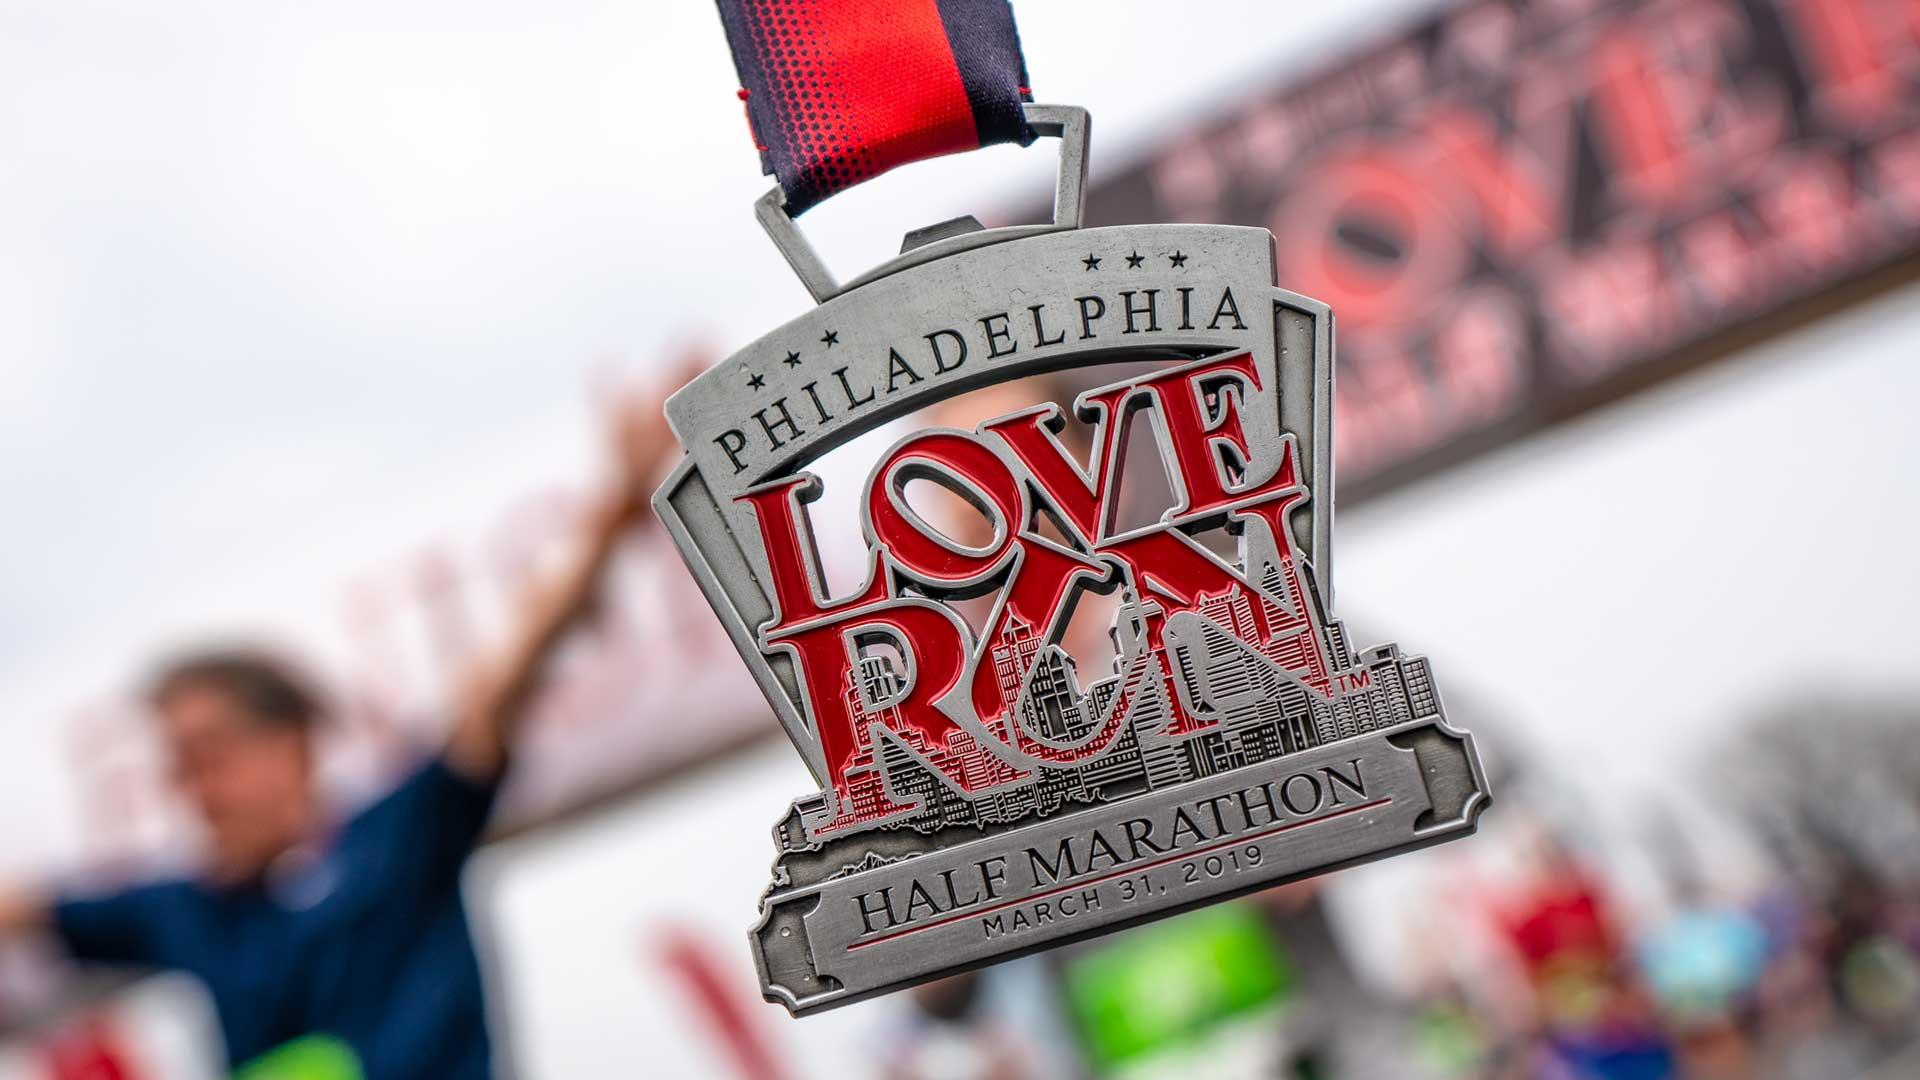 Philadelphia Love Run Medal by Always Advancing